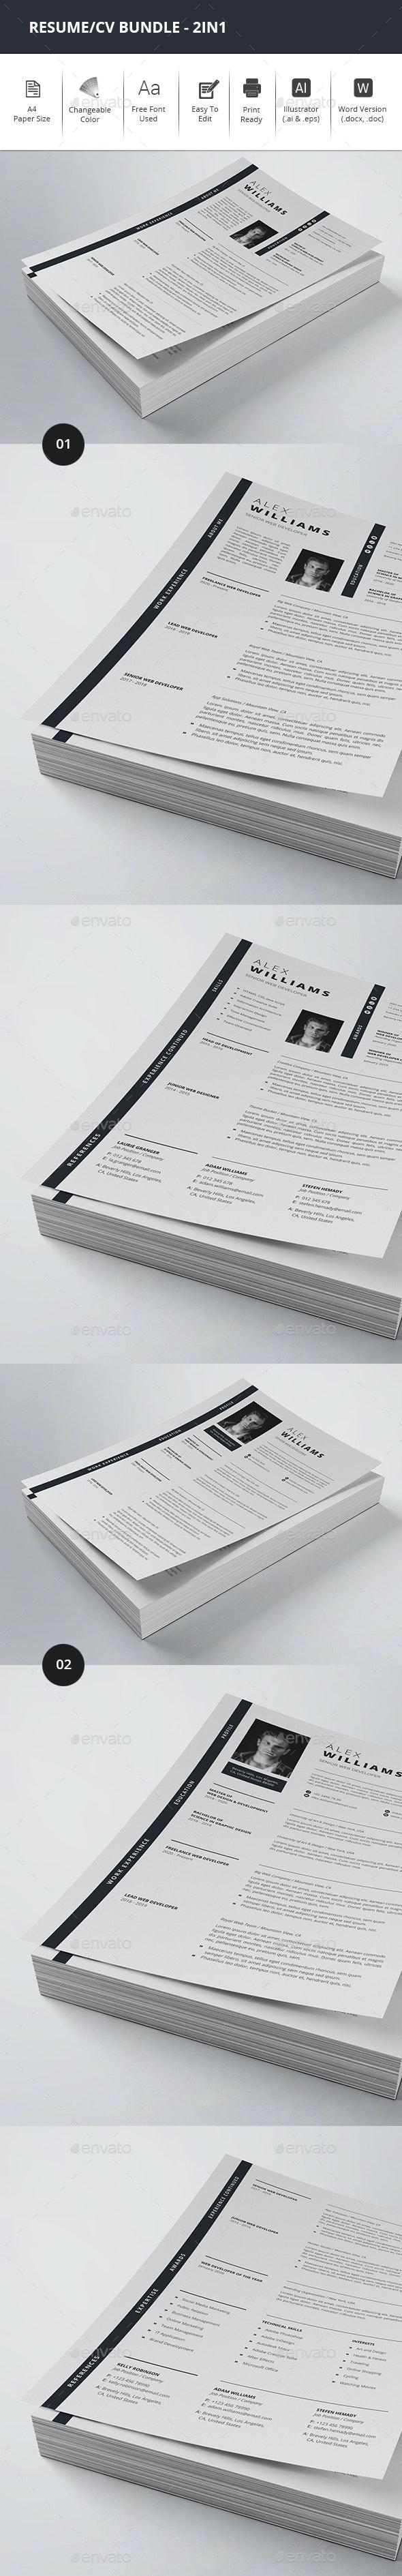 Resume/CV Bundle - 2in1 - Resumes Stationery